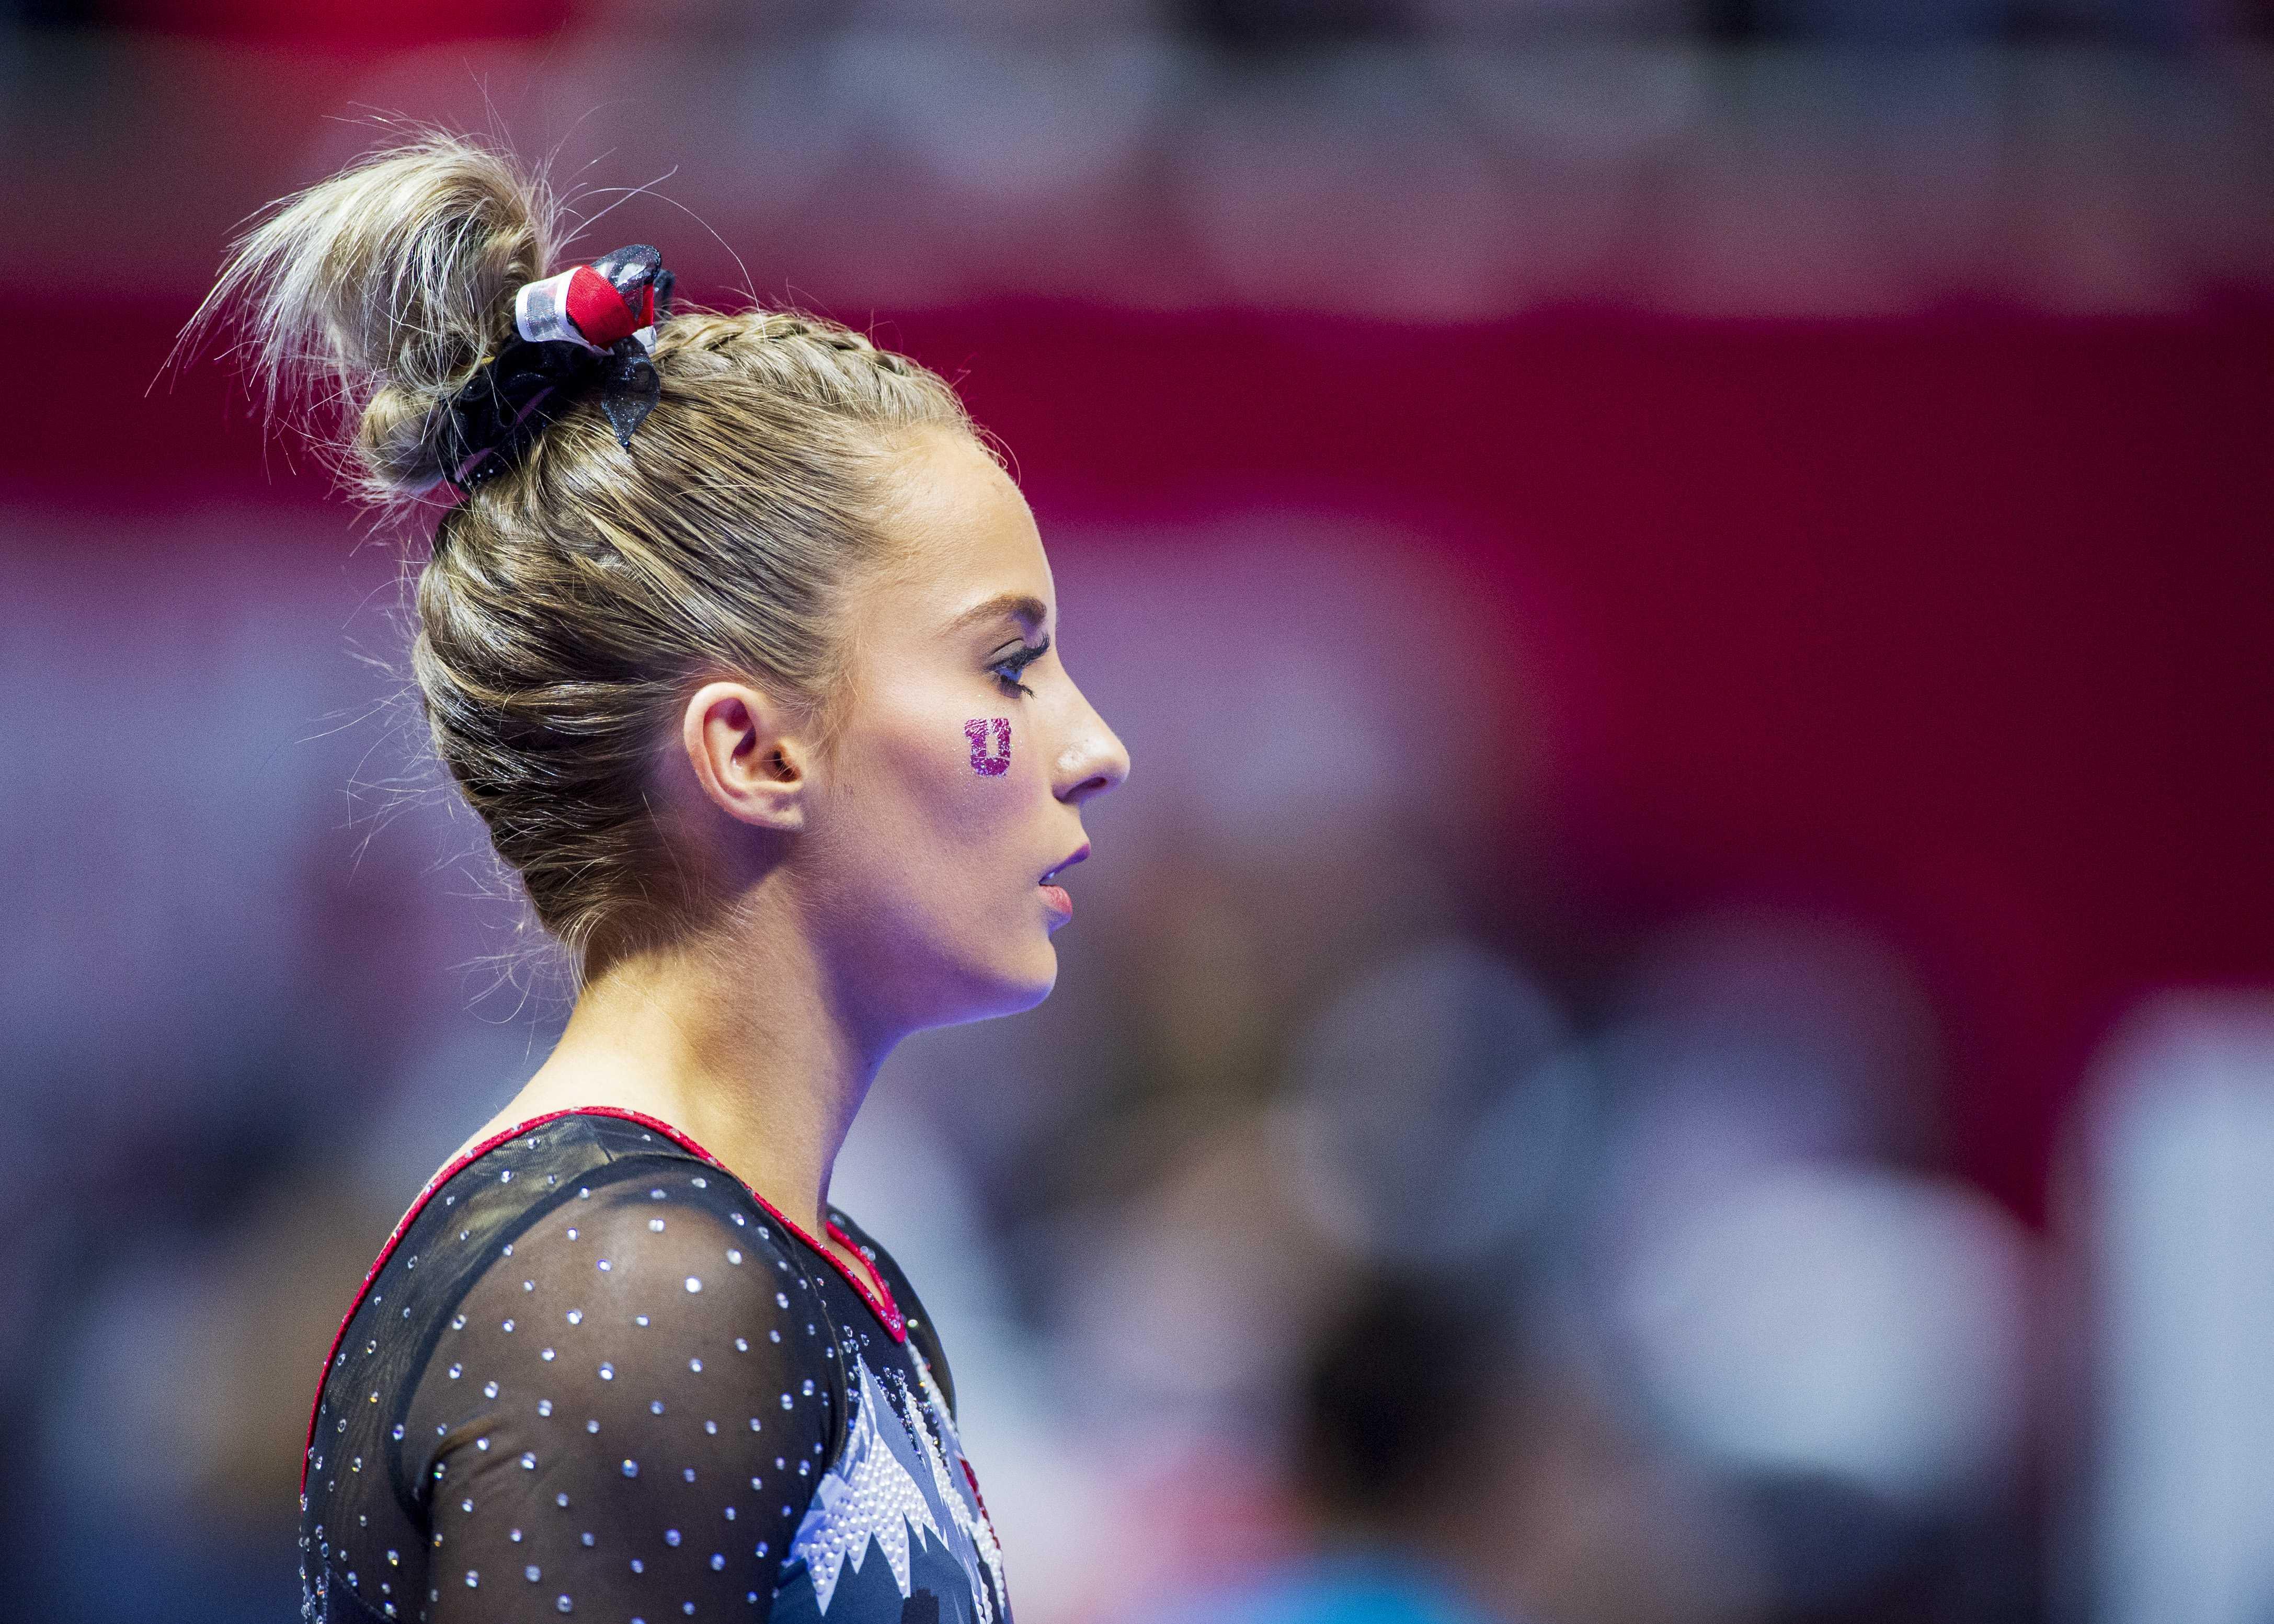 University of Utah women's gymnastics junior MyKayla Skinner performs on the balance beam in a dual meet vs. Penn State at the Jon M. Huntsman Center in Salt Lake City, Utah on Saturday, Jan. 5, 2019.  (Photo by Kiffer Creveling | The Daily Utah Chronicle)